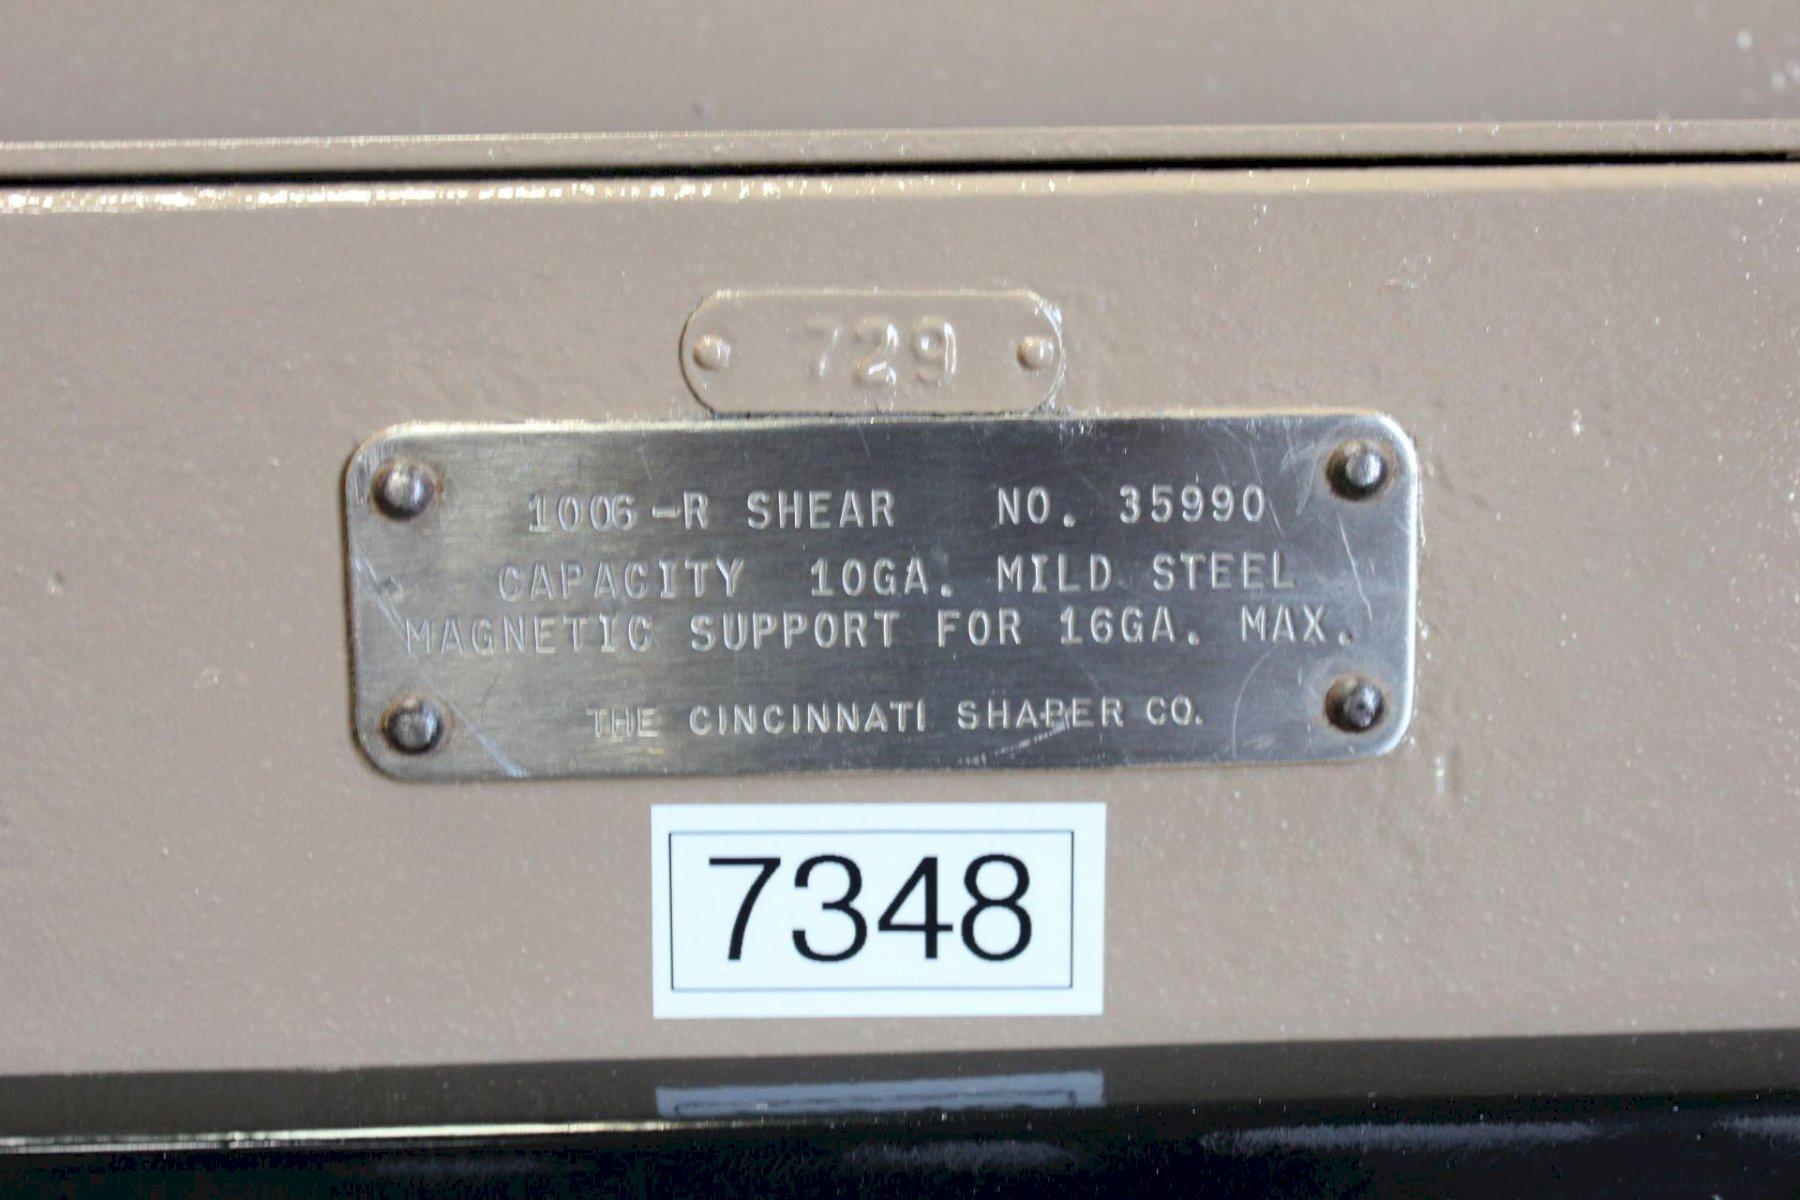 Cincinnati Power Shear 10 Ga. x 6' #5905